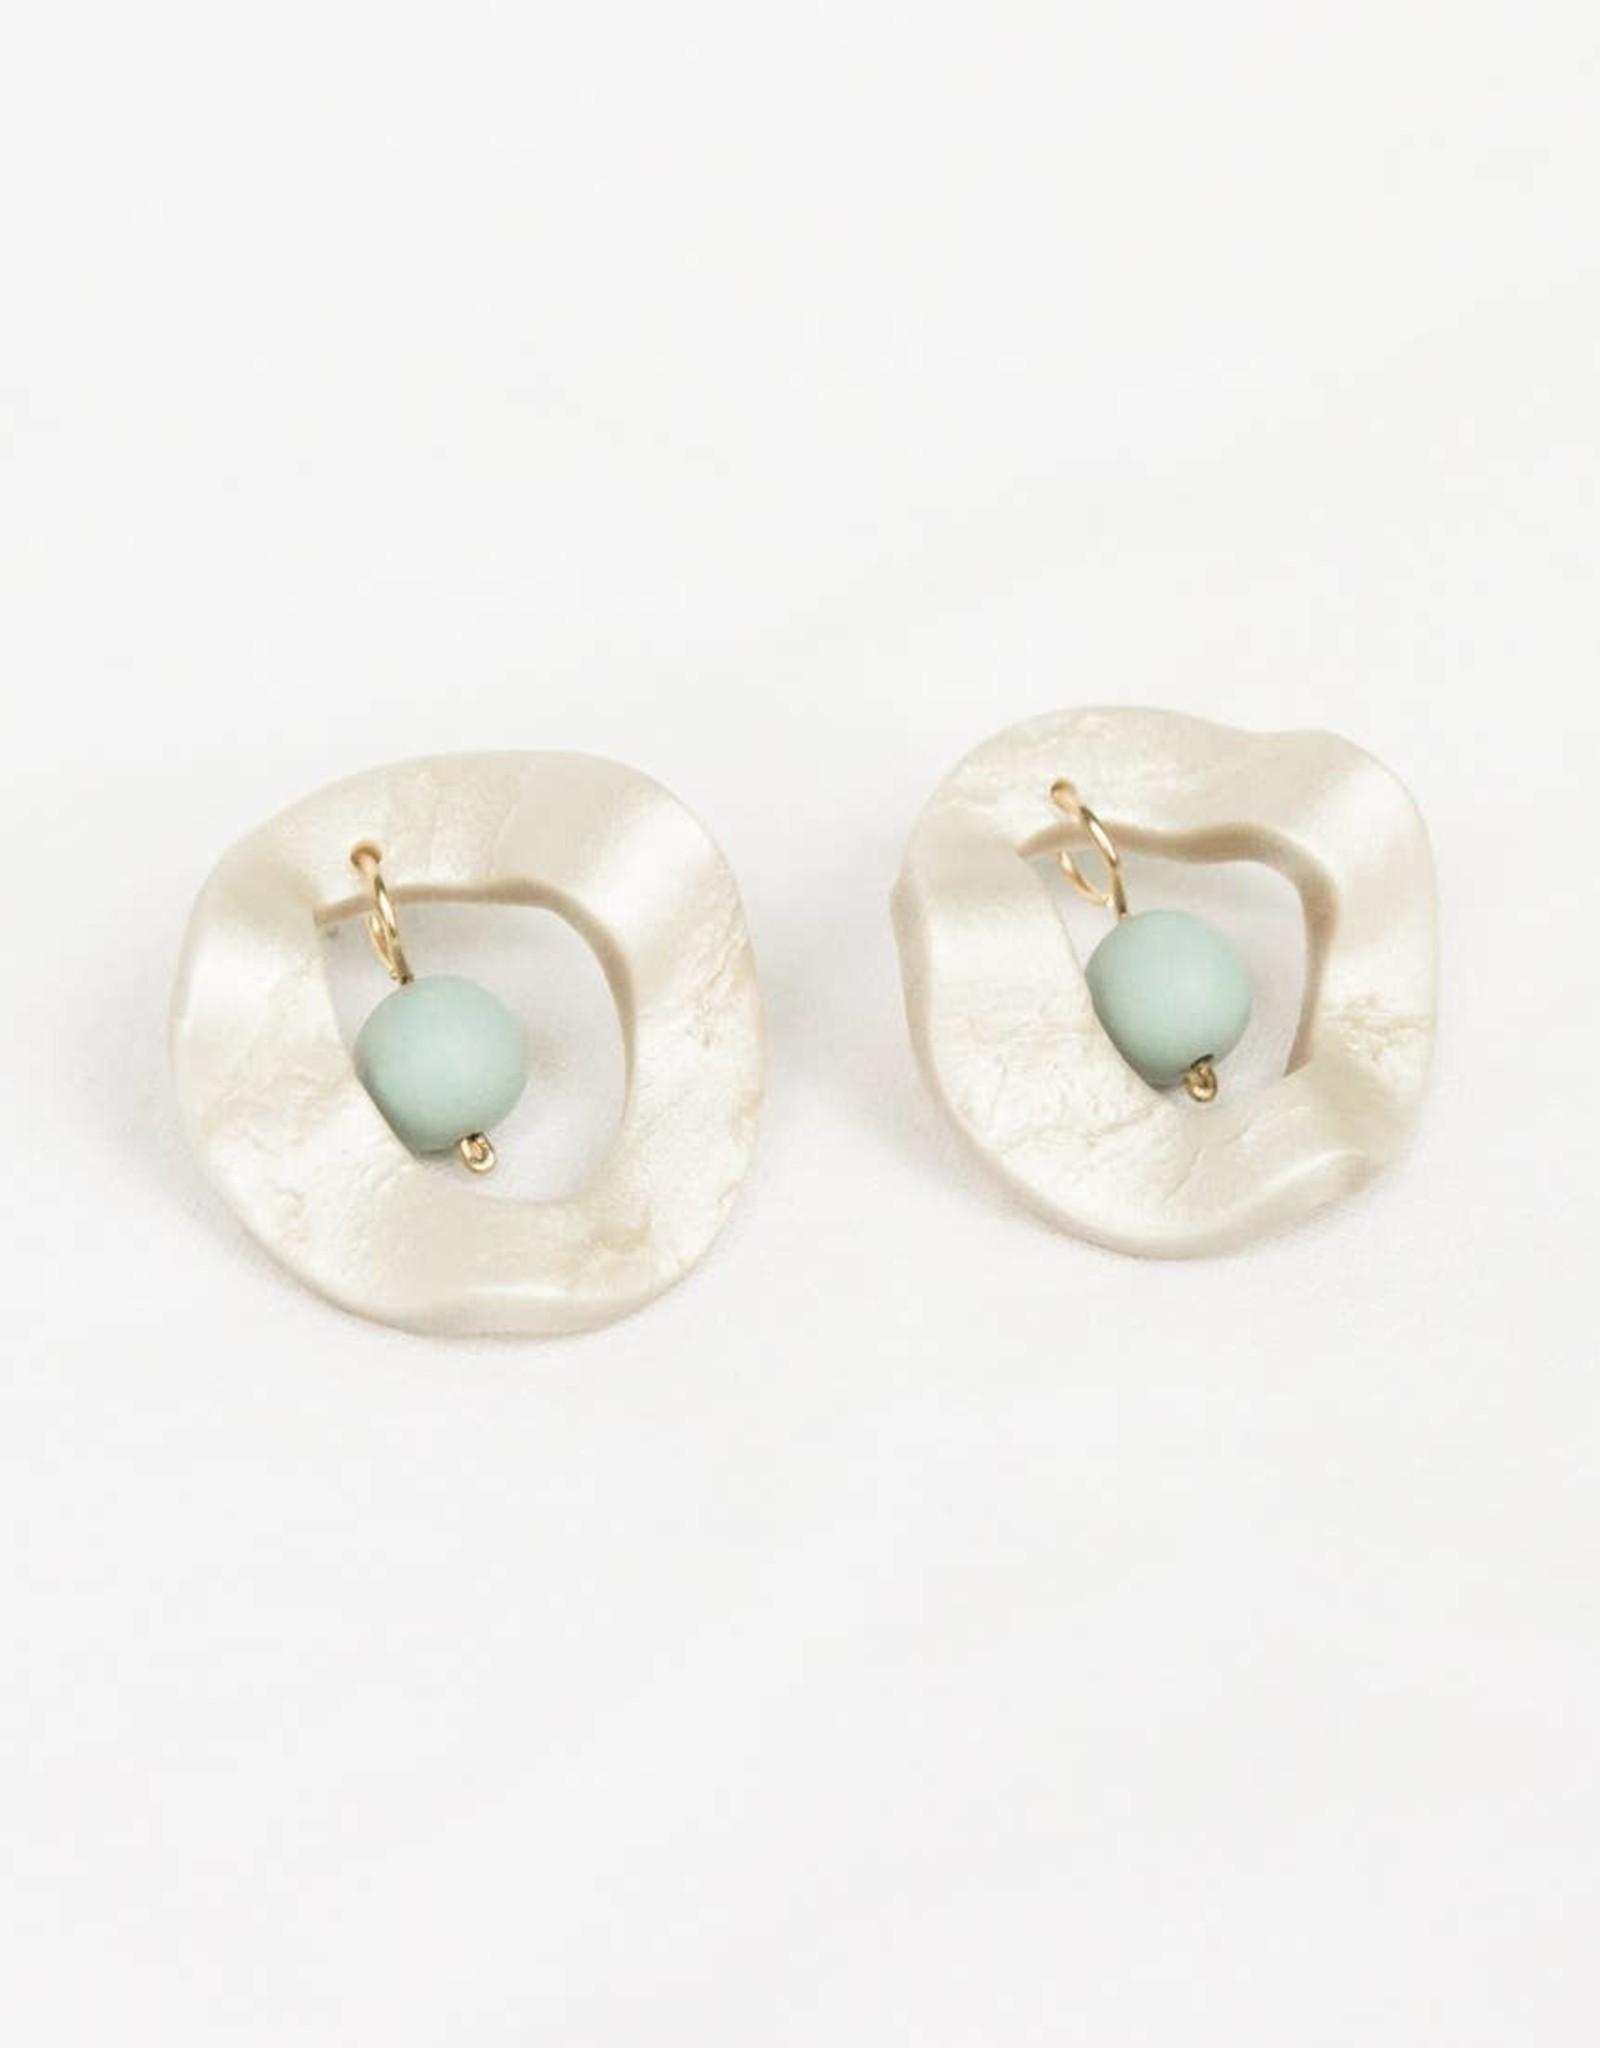 Skinny Dip Jewelry Skinny Dip Jewelry   Sabyle Post Earring